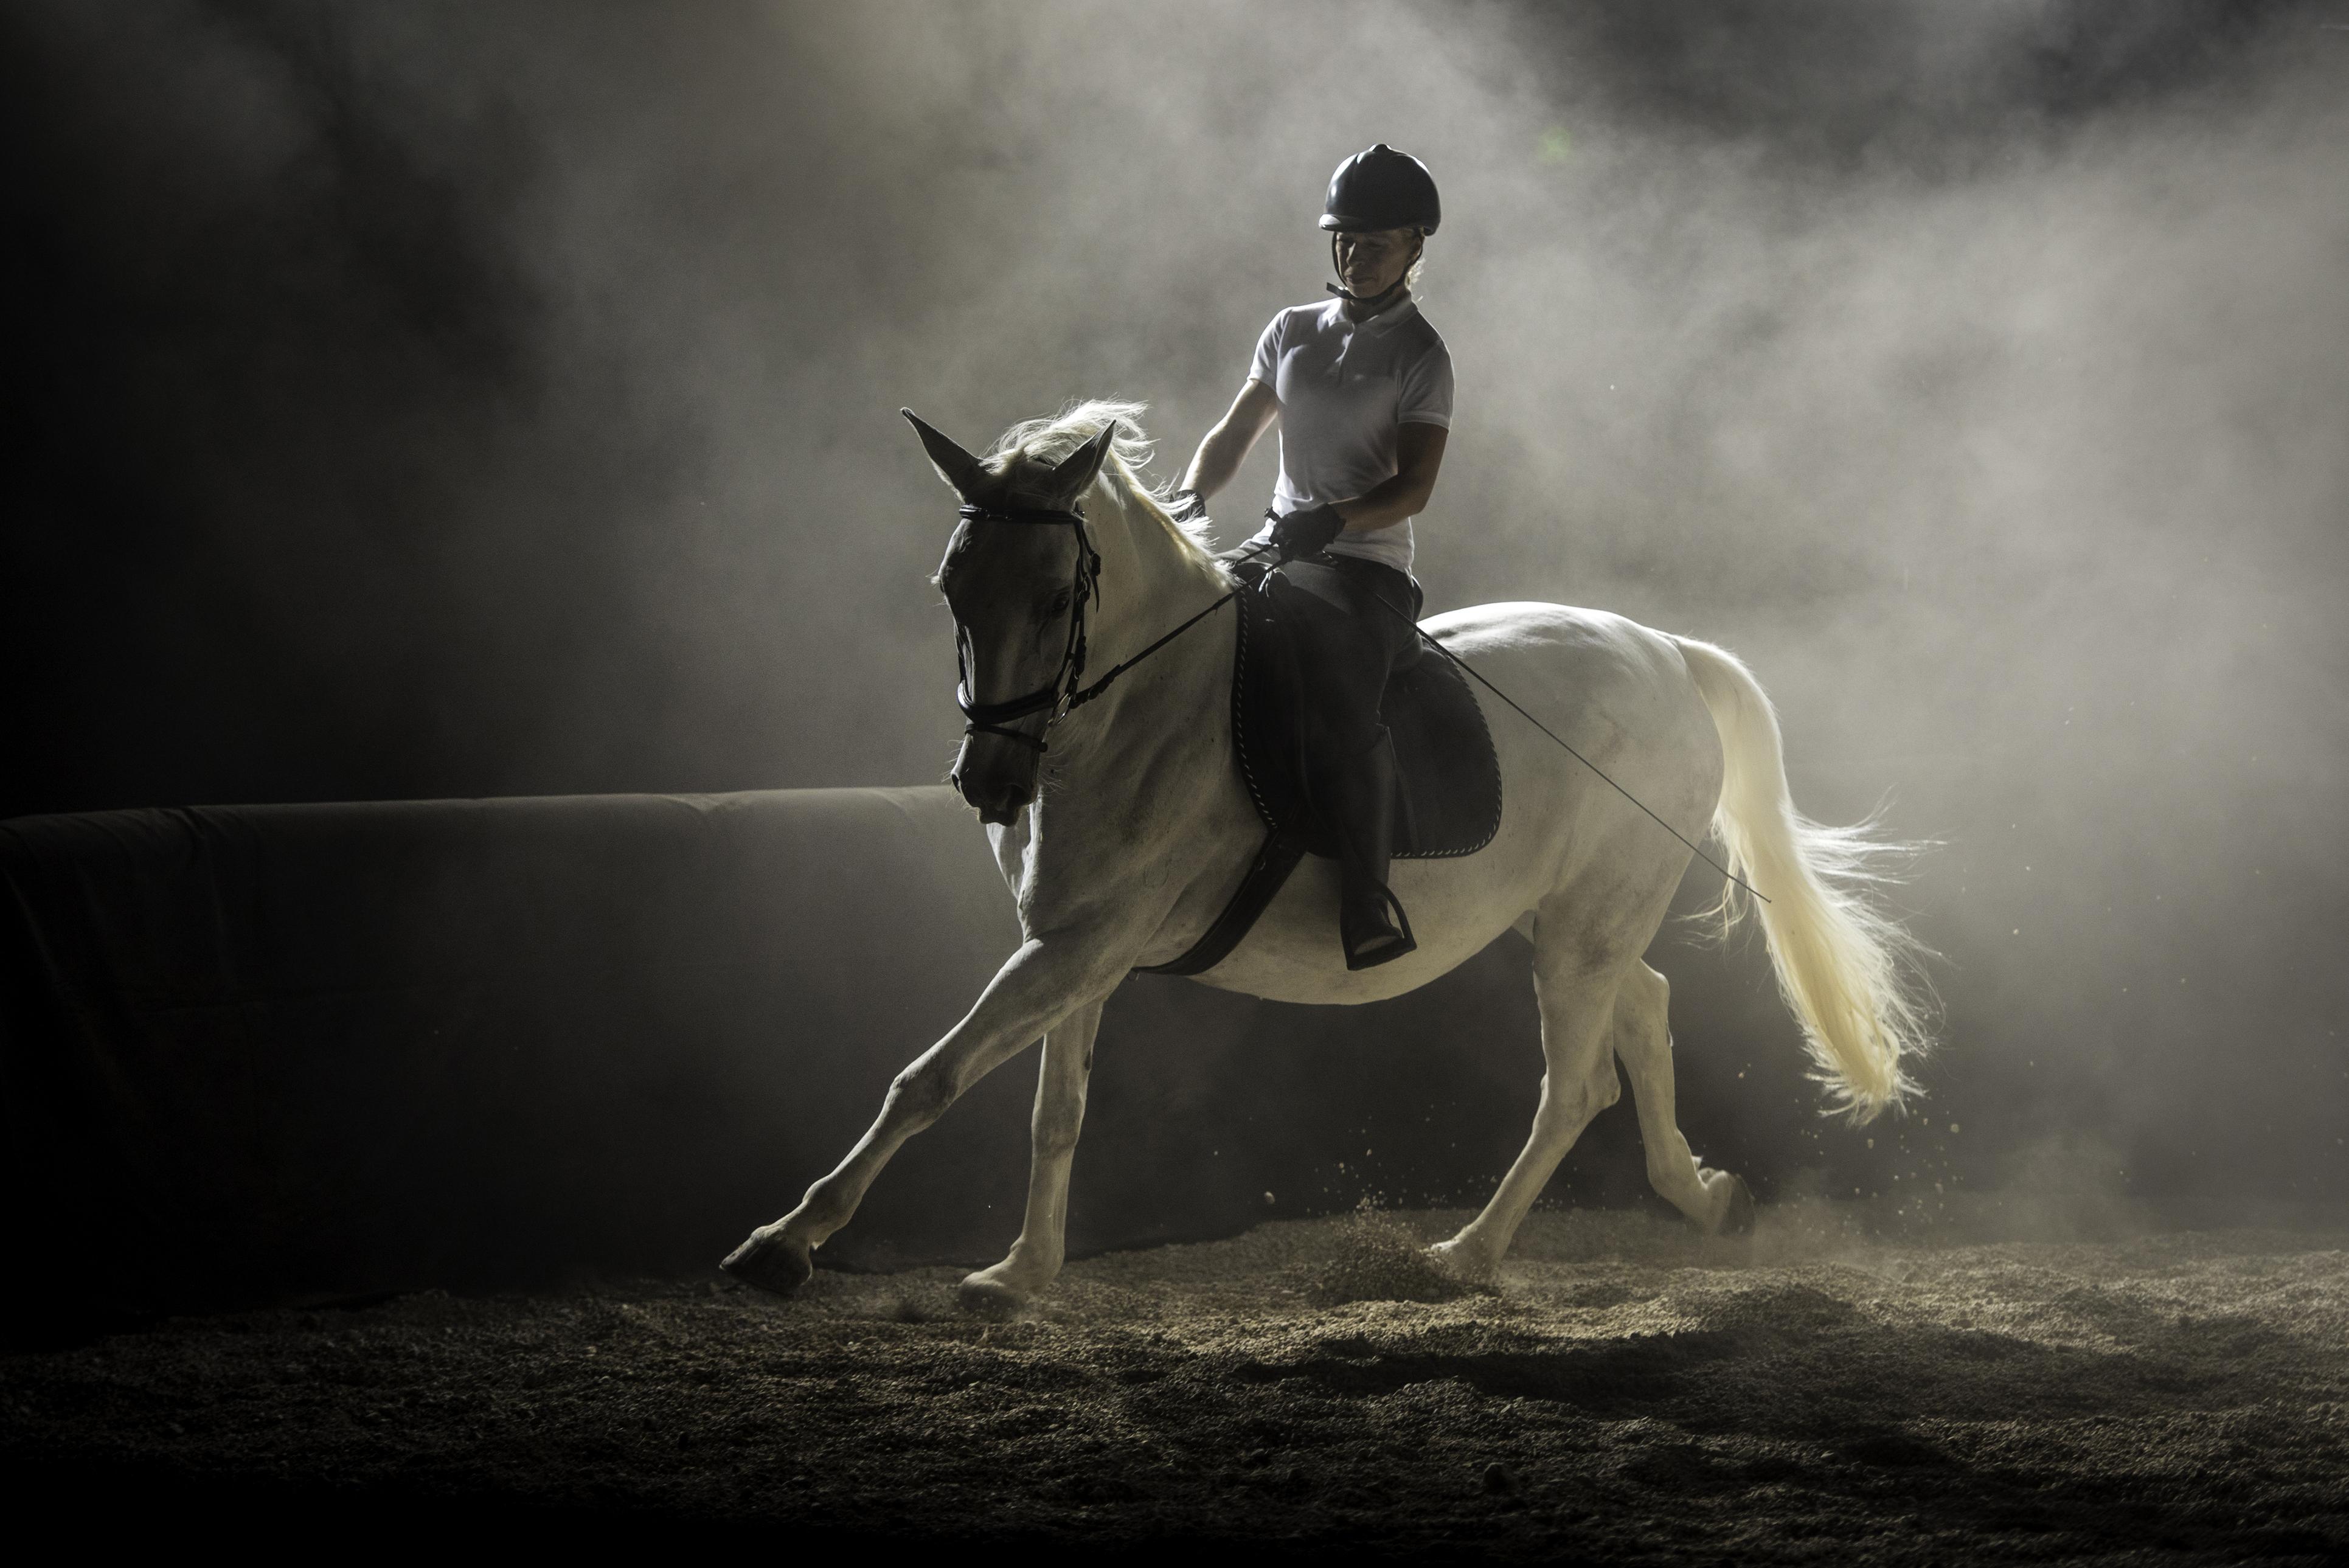 equine-istock-504829534.jpg